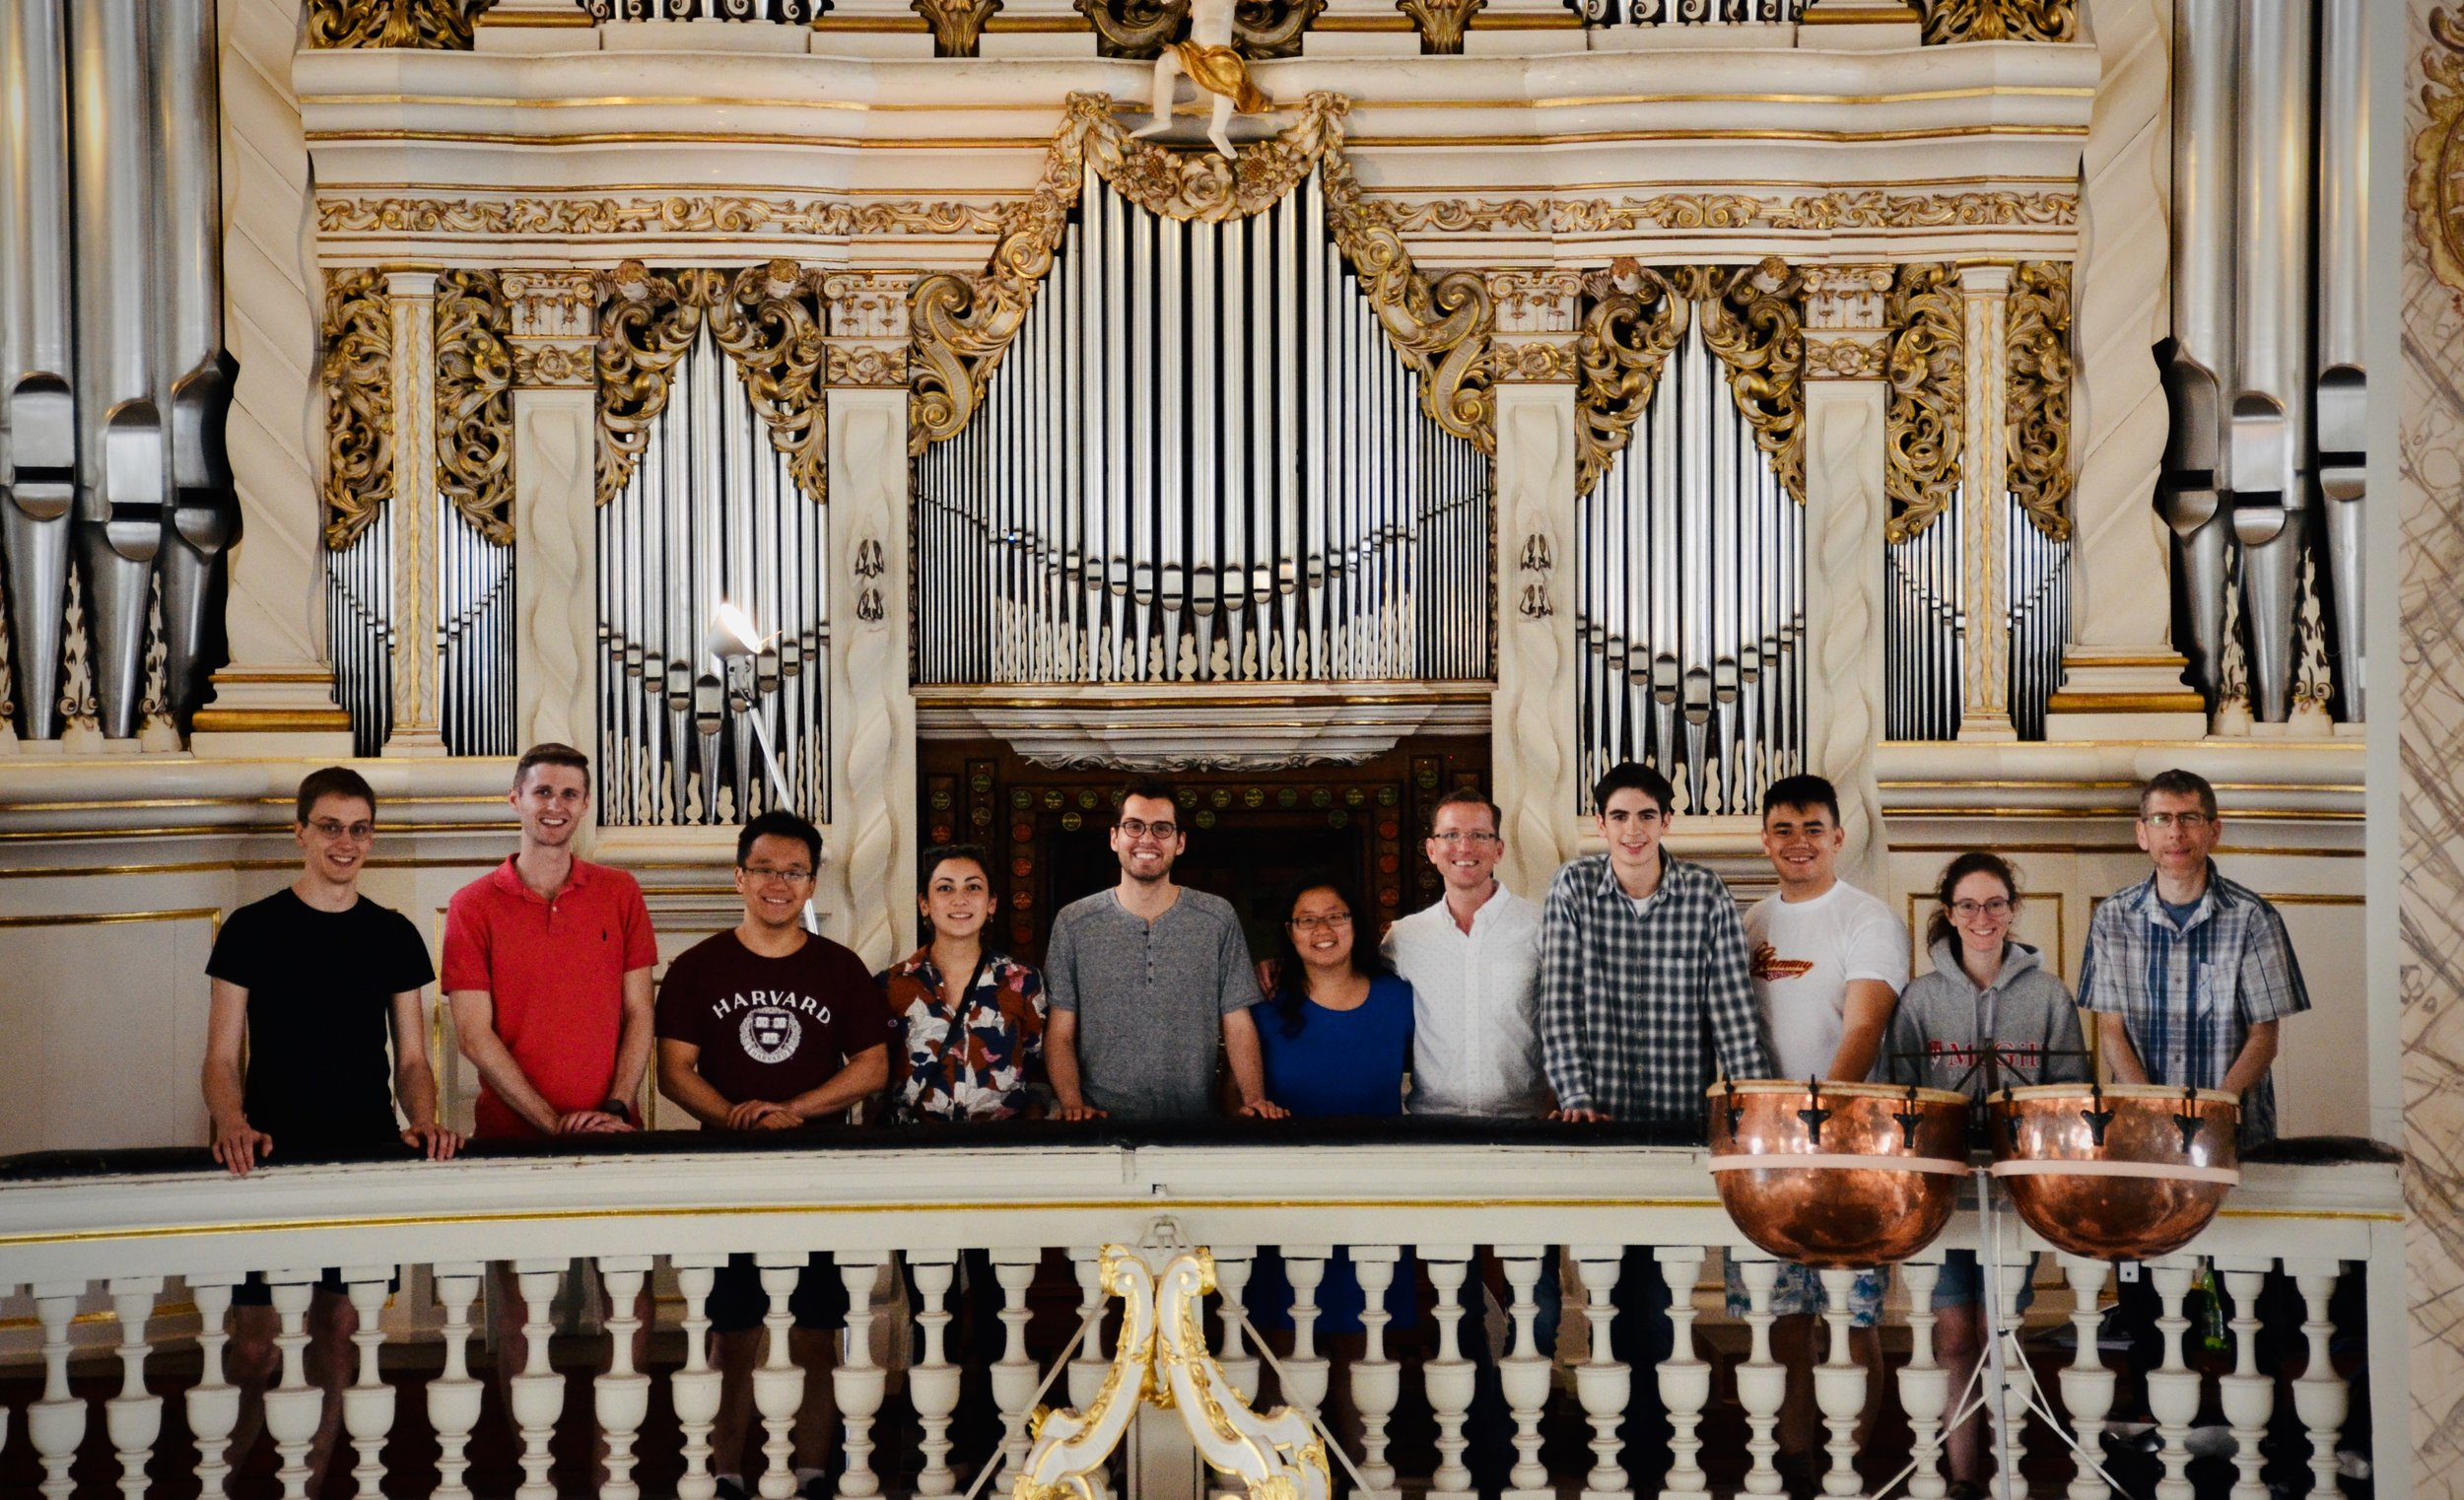 Members of Boston Organ Studio visit the 1730 Trost Organ, Stadtkirche, Waltershausen.